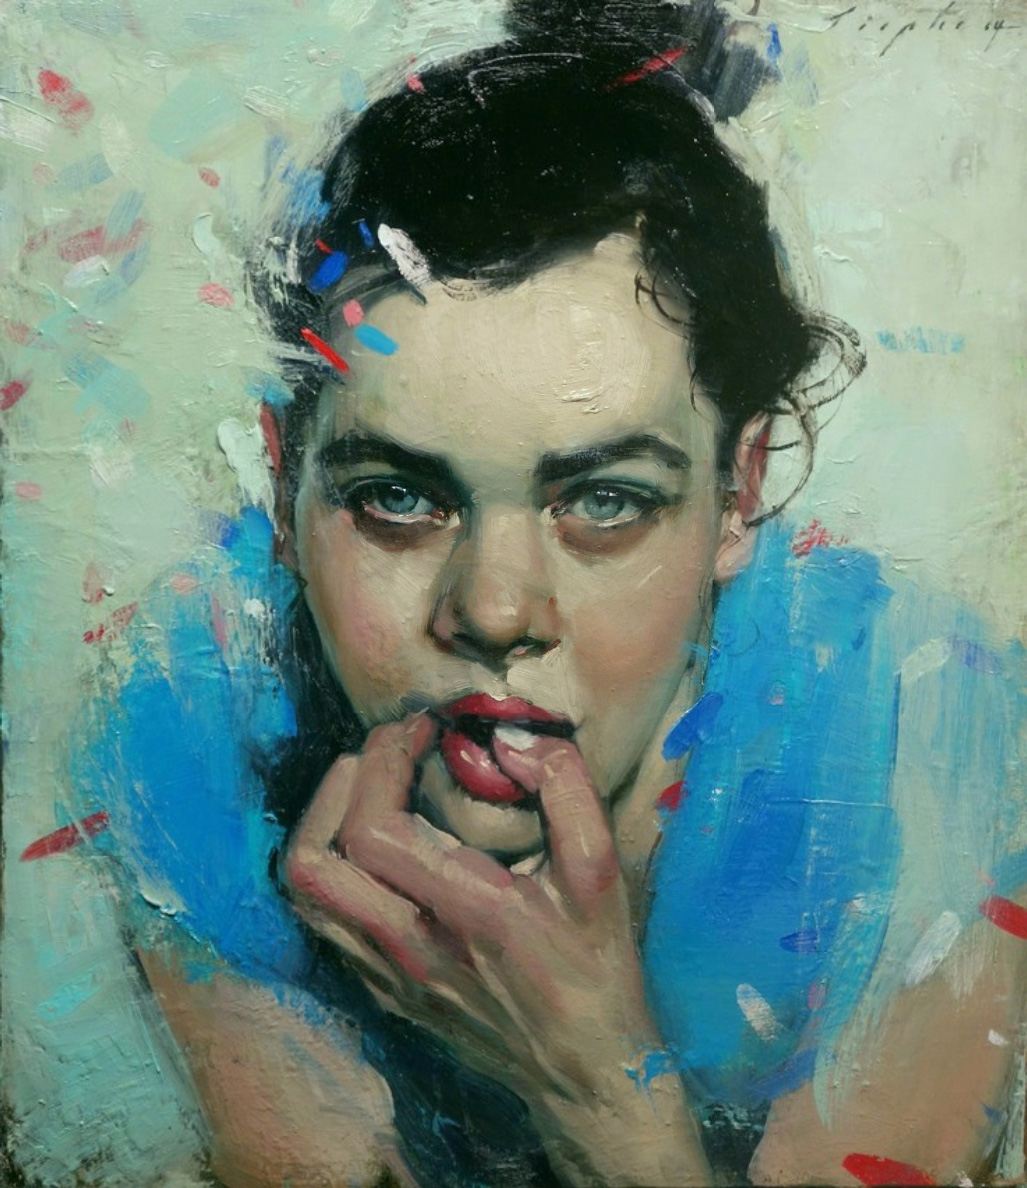 Confetti, 2014 by Malcolm T. Liepke | Yellowtrace